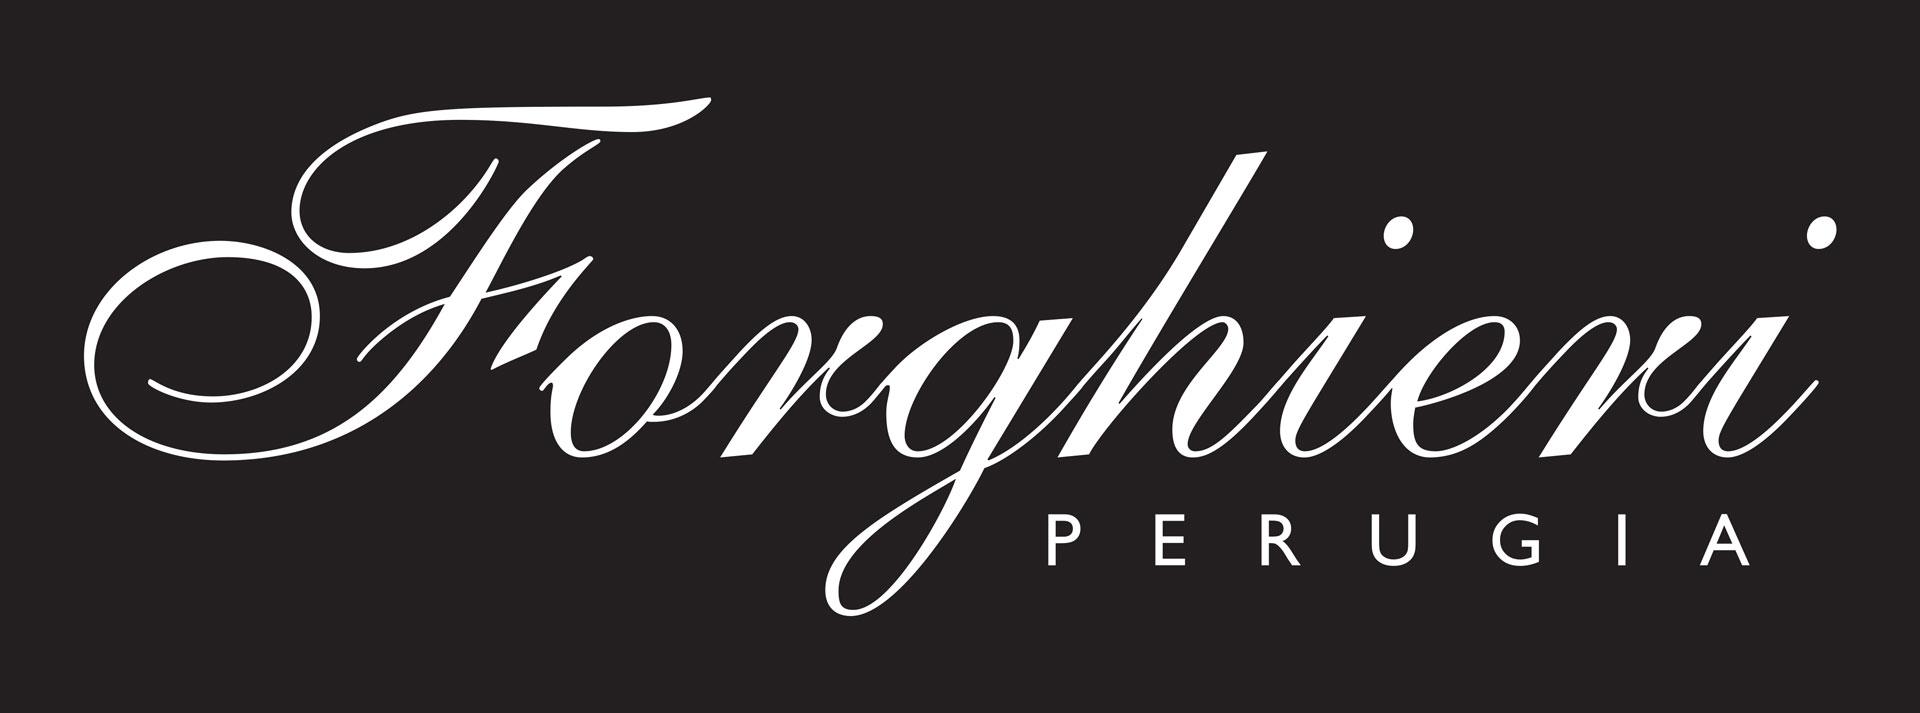 Forghieri Perugia